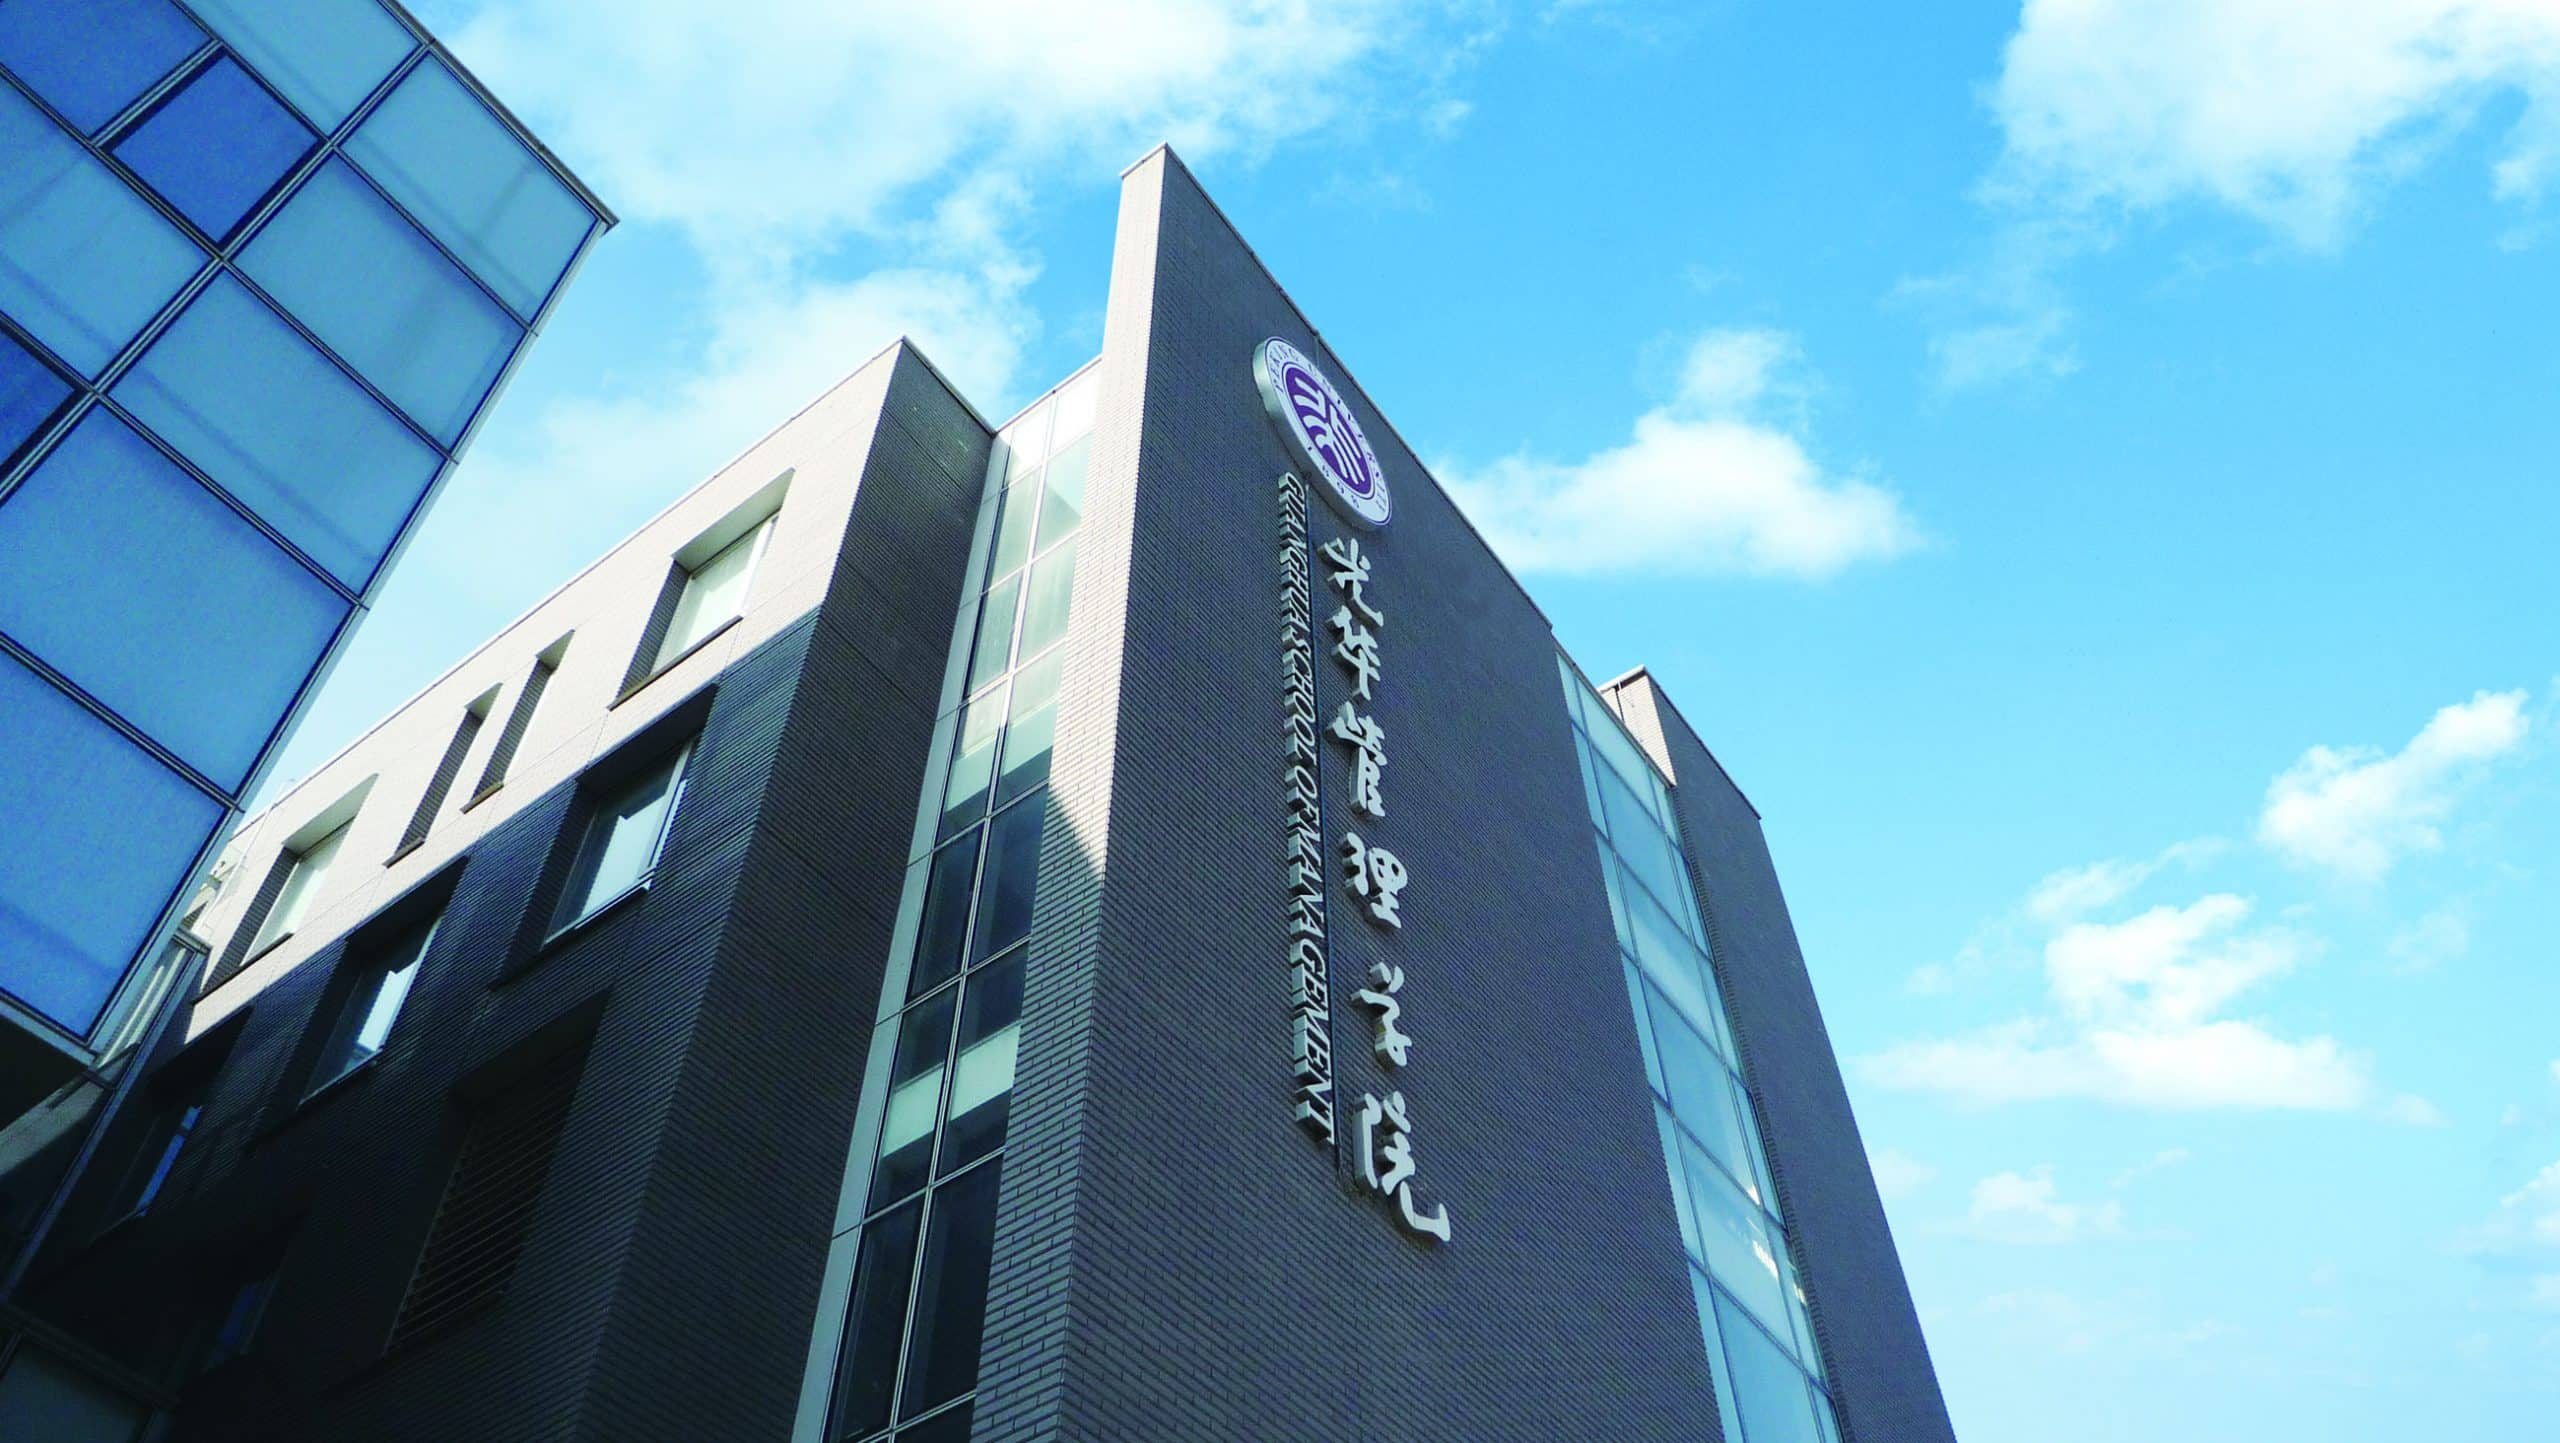 Guanghua Management School Scholarships